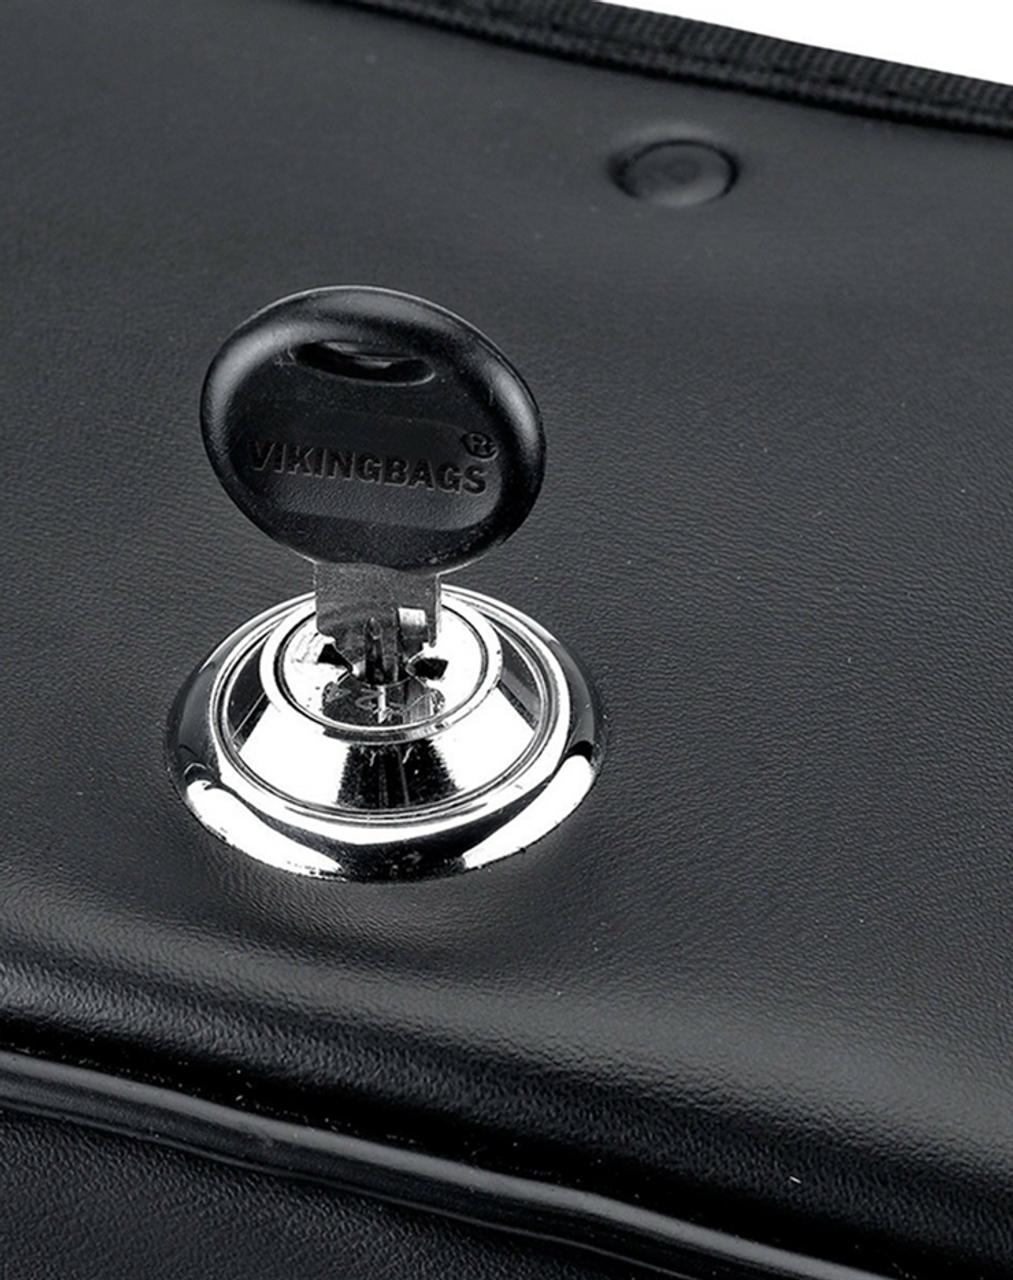 Triumph Rocket III Roadster Side Pocket Motorcycle Saddlebags Key Lock View